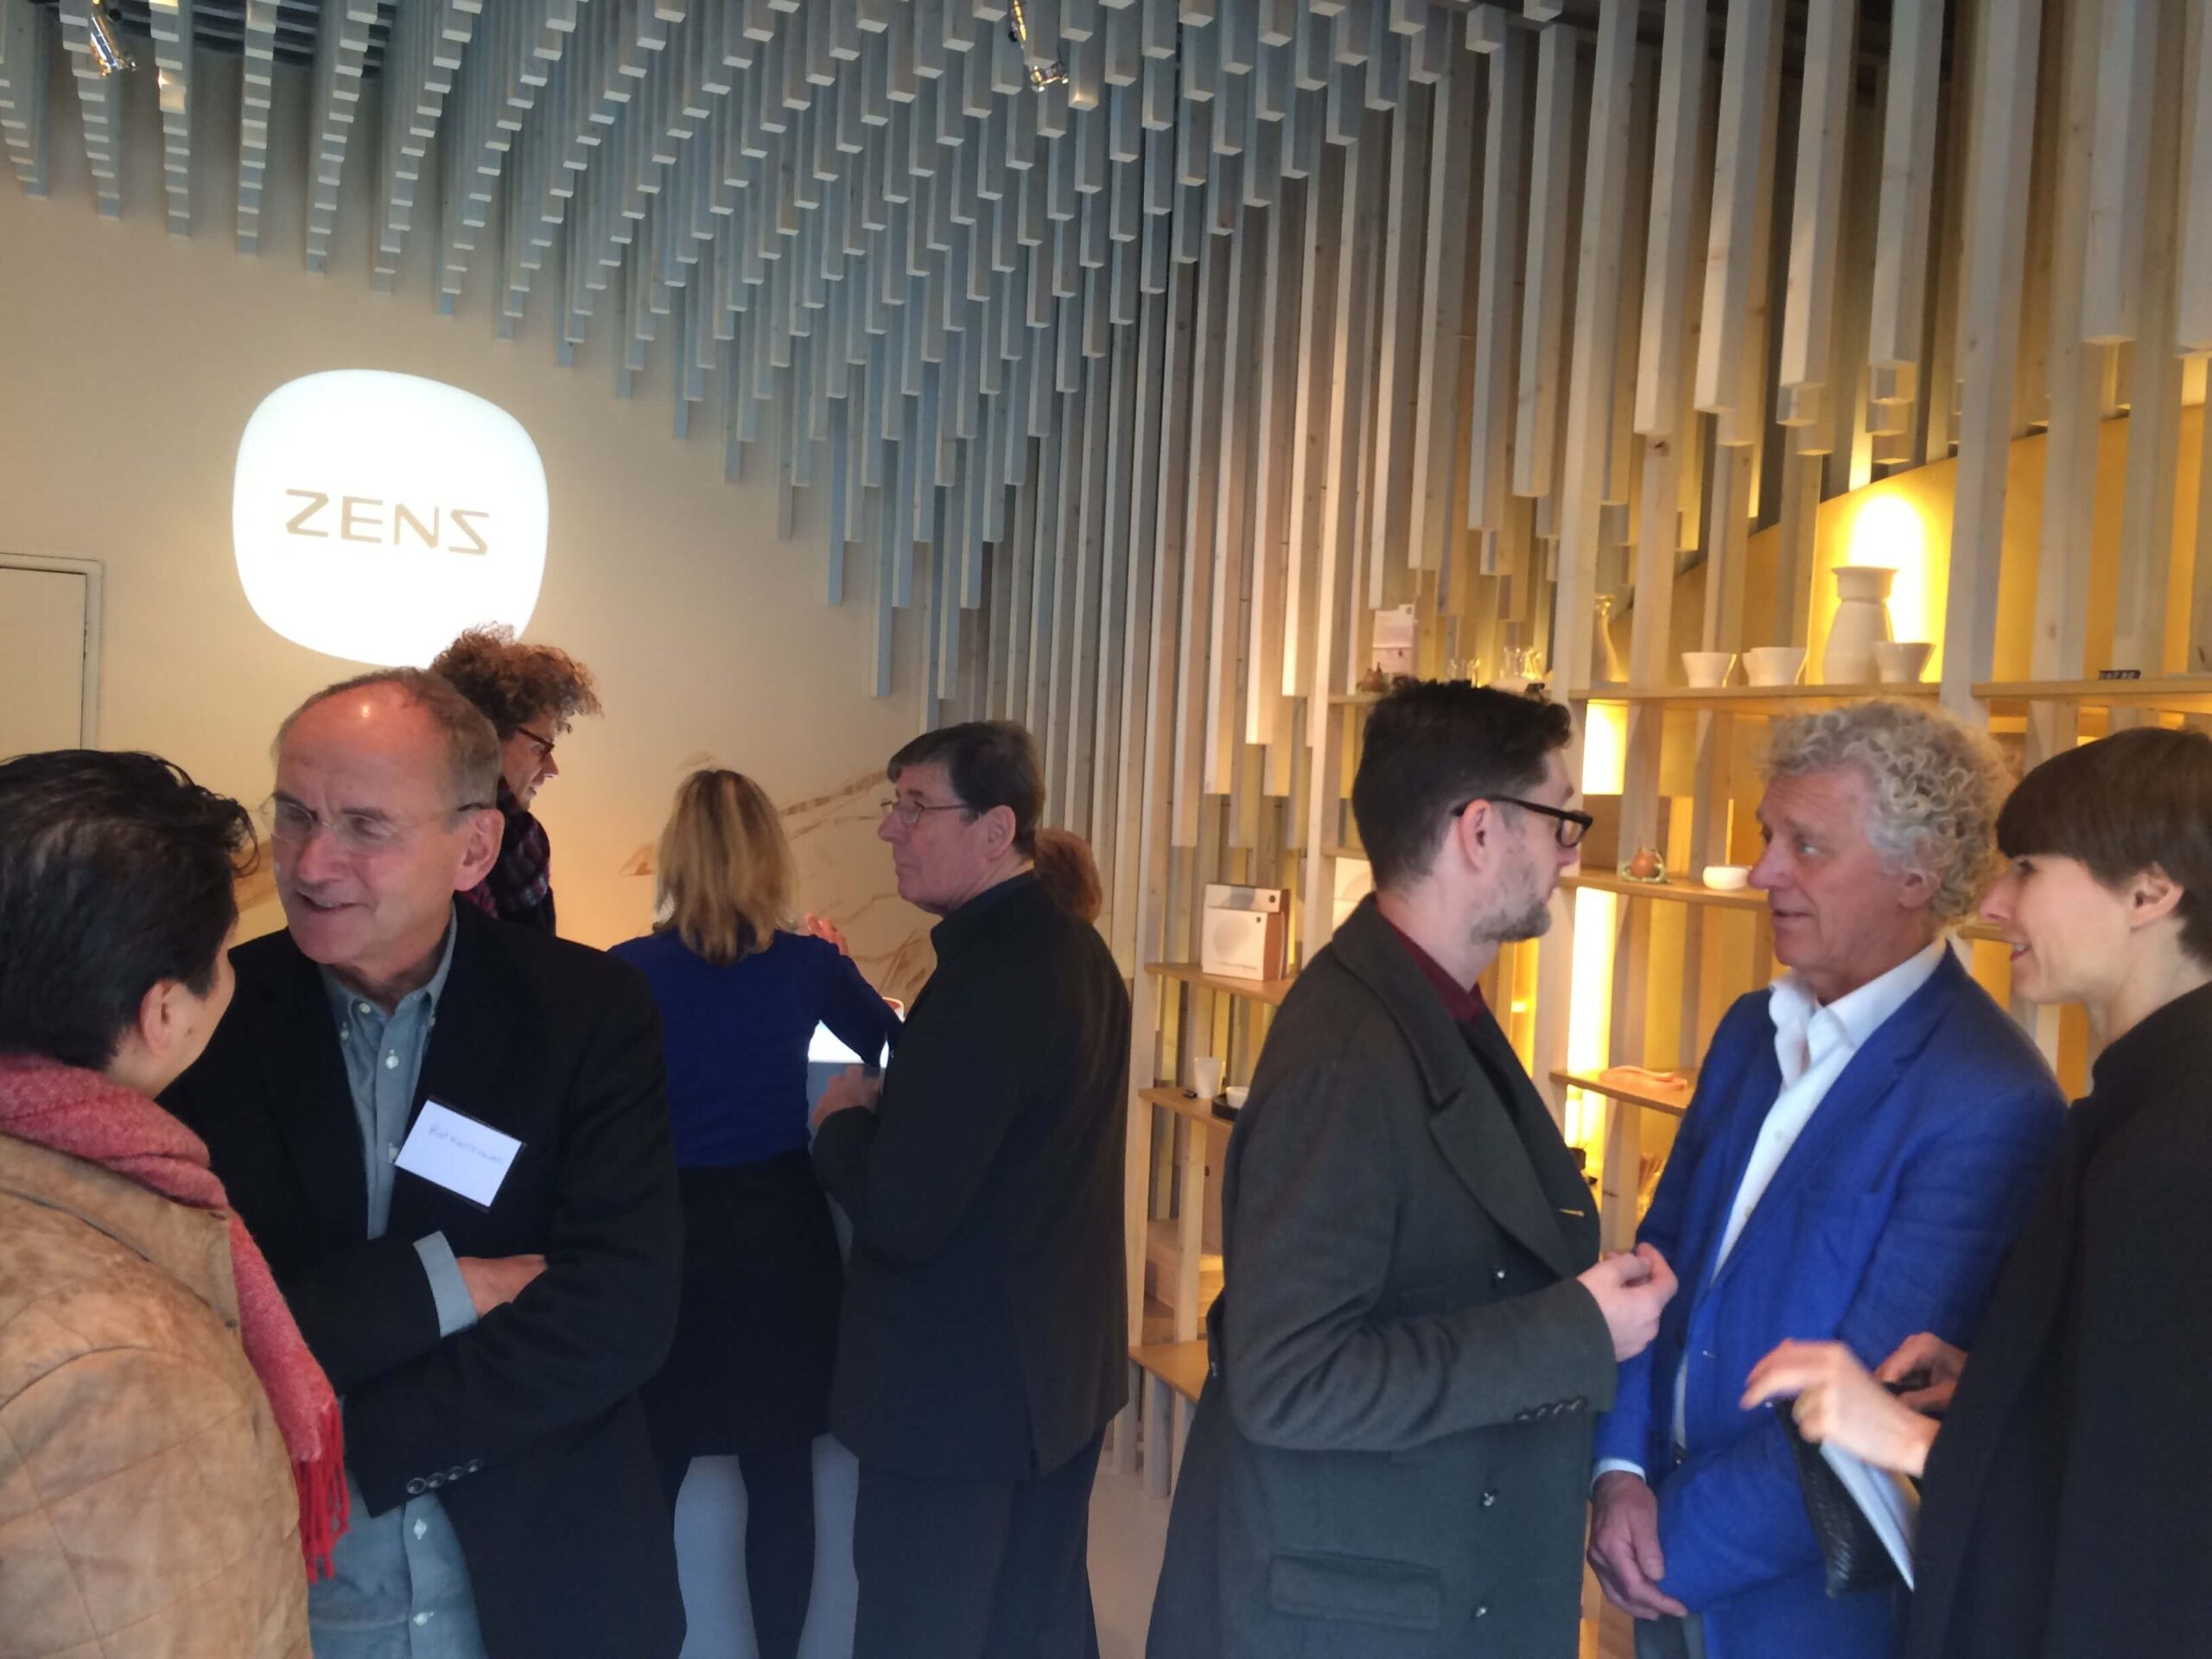 zens tea retail store opening ceremony in Amsterdam